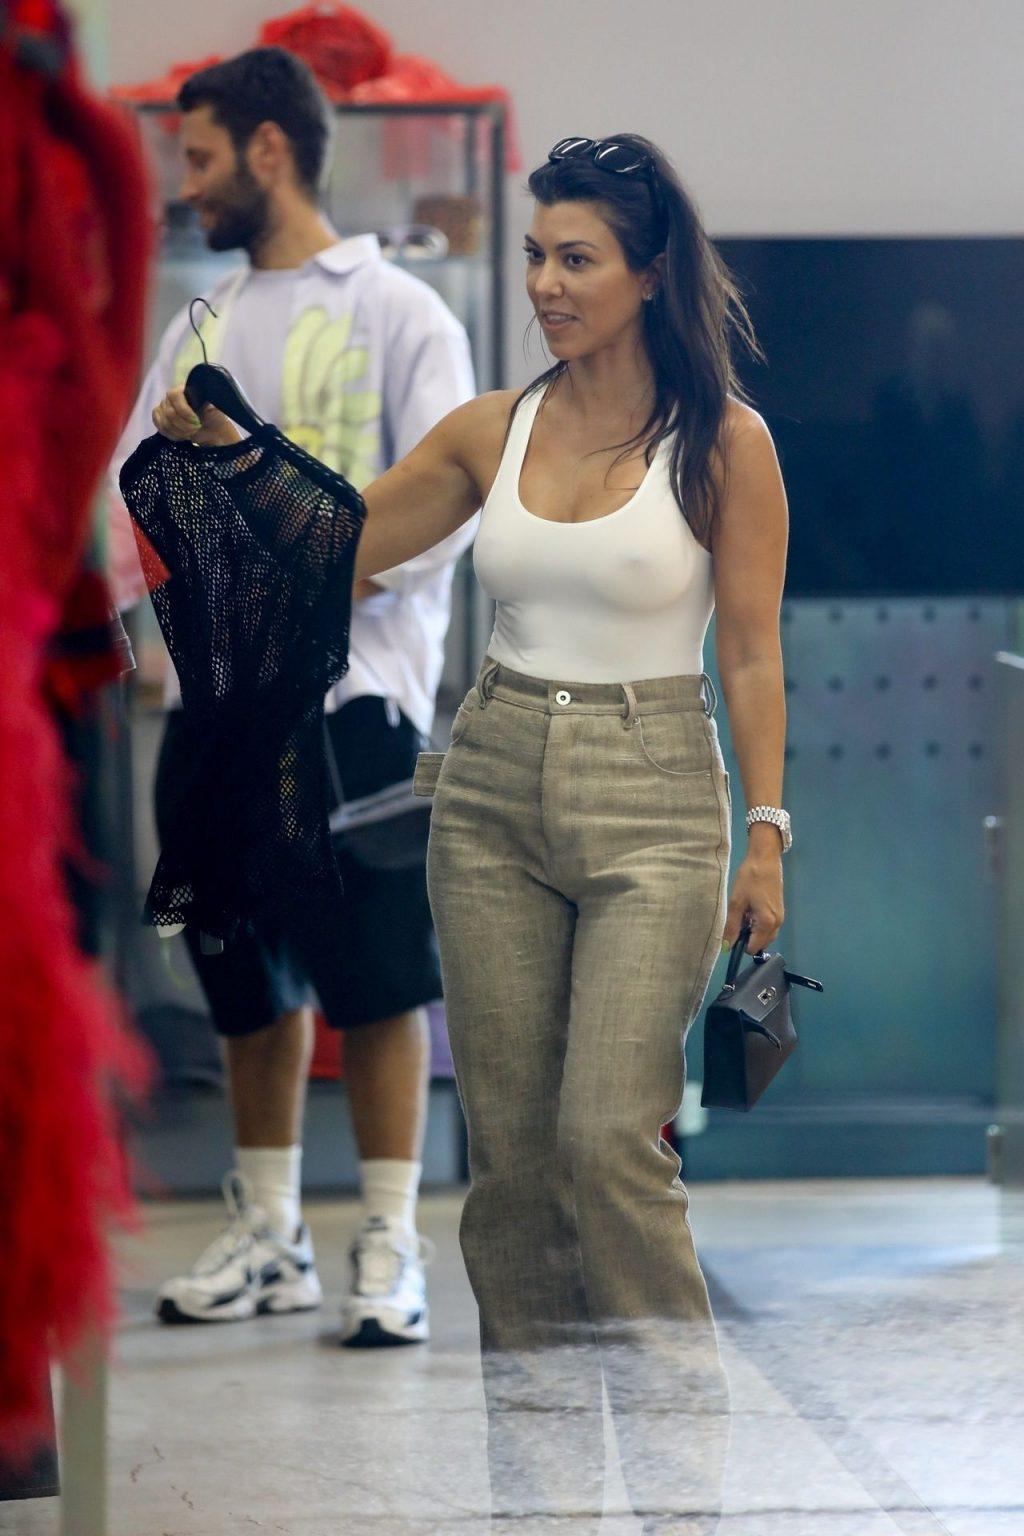 Kourtney Kardashian See Through Thefappeningblog Com 123 102